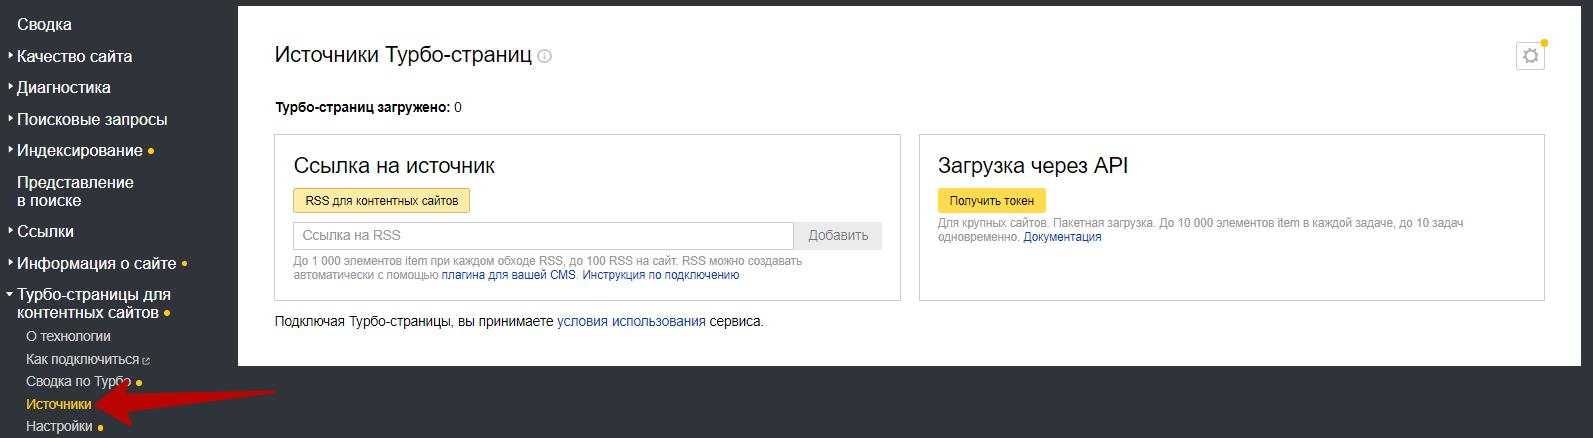 Яндекс Вебмастер – источники турбо-страниц